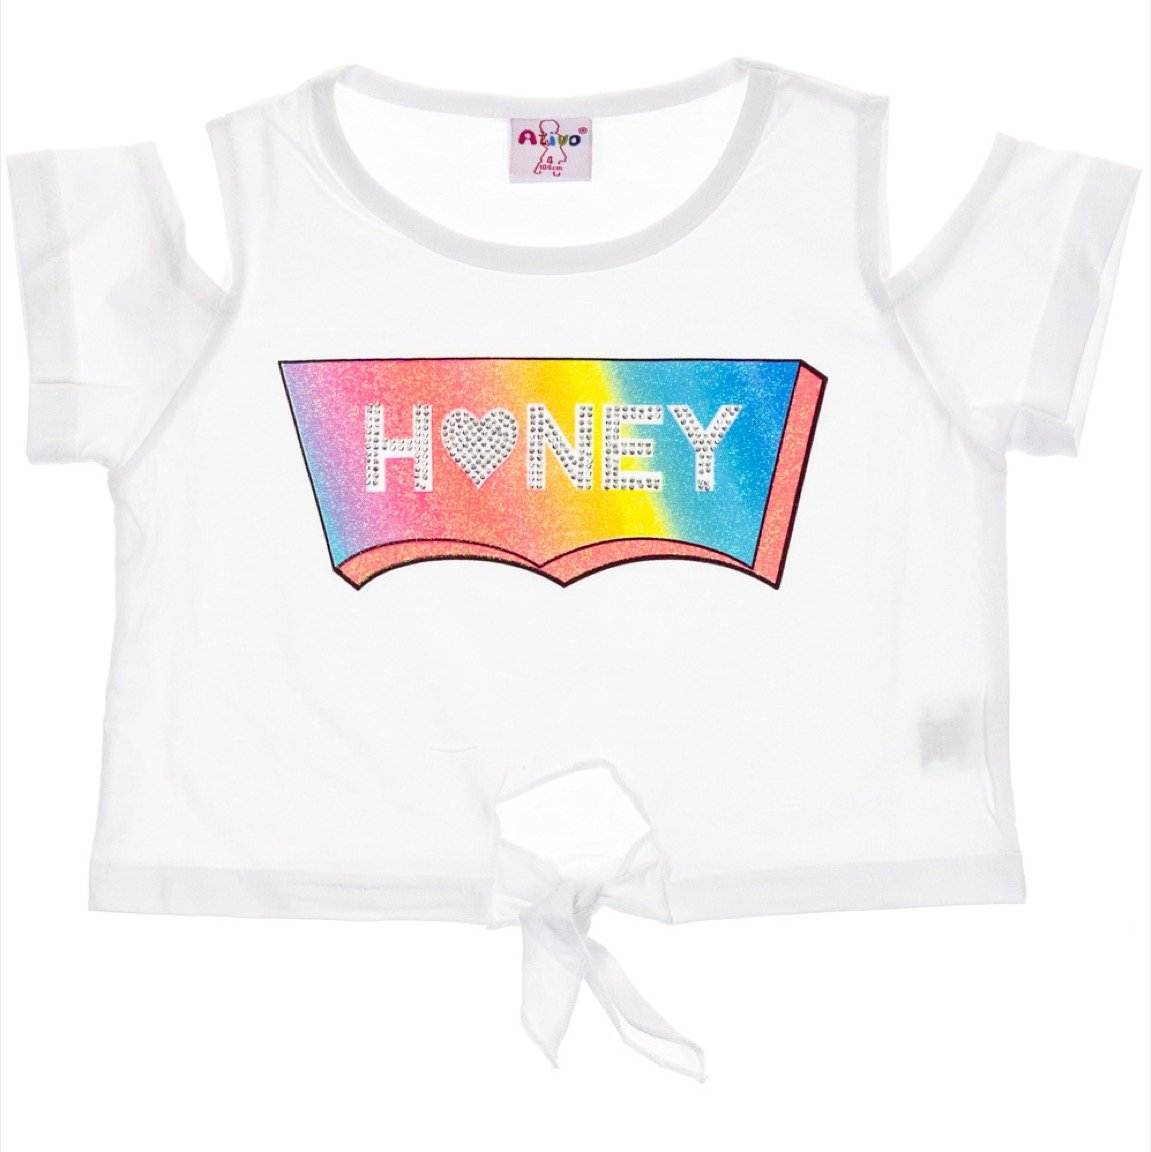 Ativo παιδική μπλούζα κοντή «White Honey»